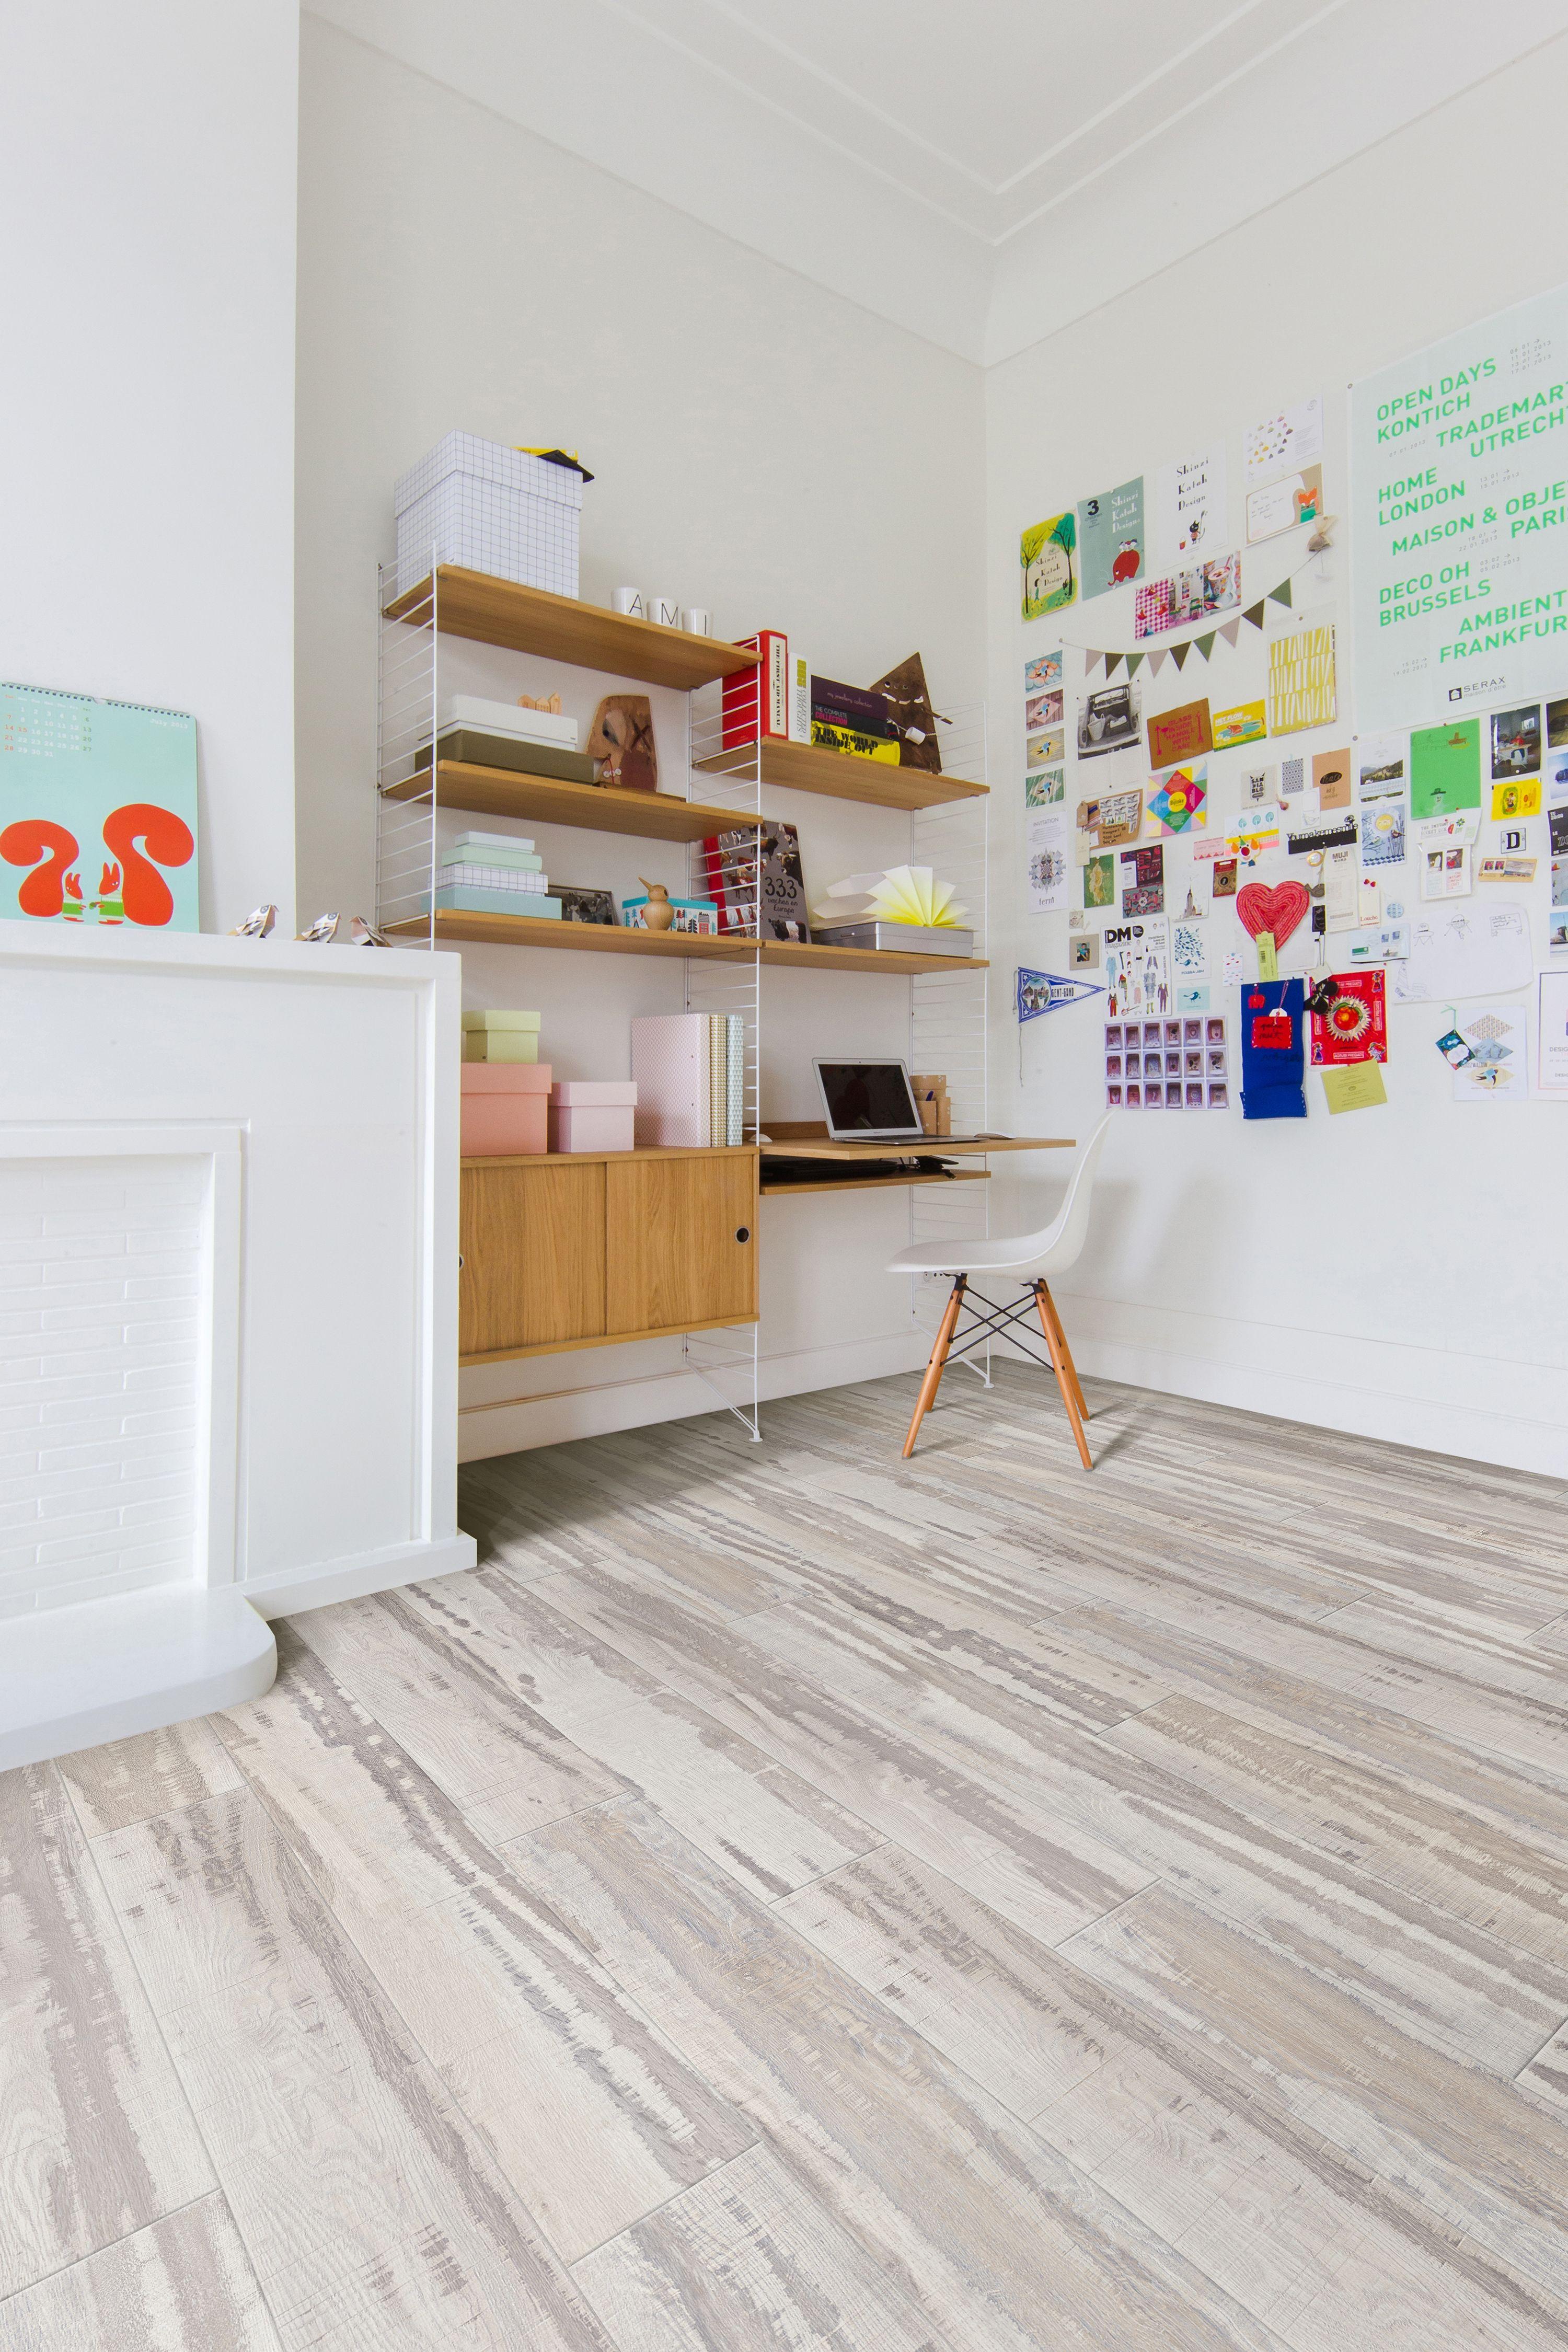 Amp up your home office with ivcs bayside everwood 002 laminate wood look laminate floor ivc us balterio armstrong tarkett hardwood bamboo cork laminate vinyl dailygadgetfo Choice Image